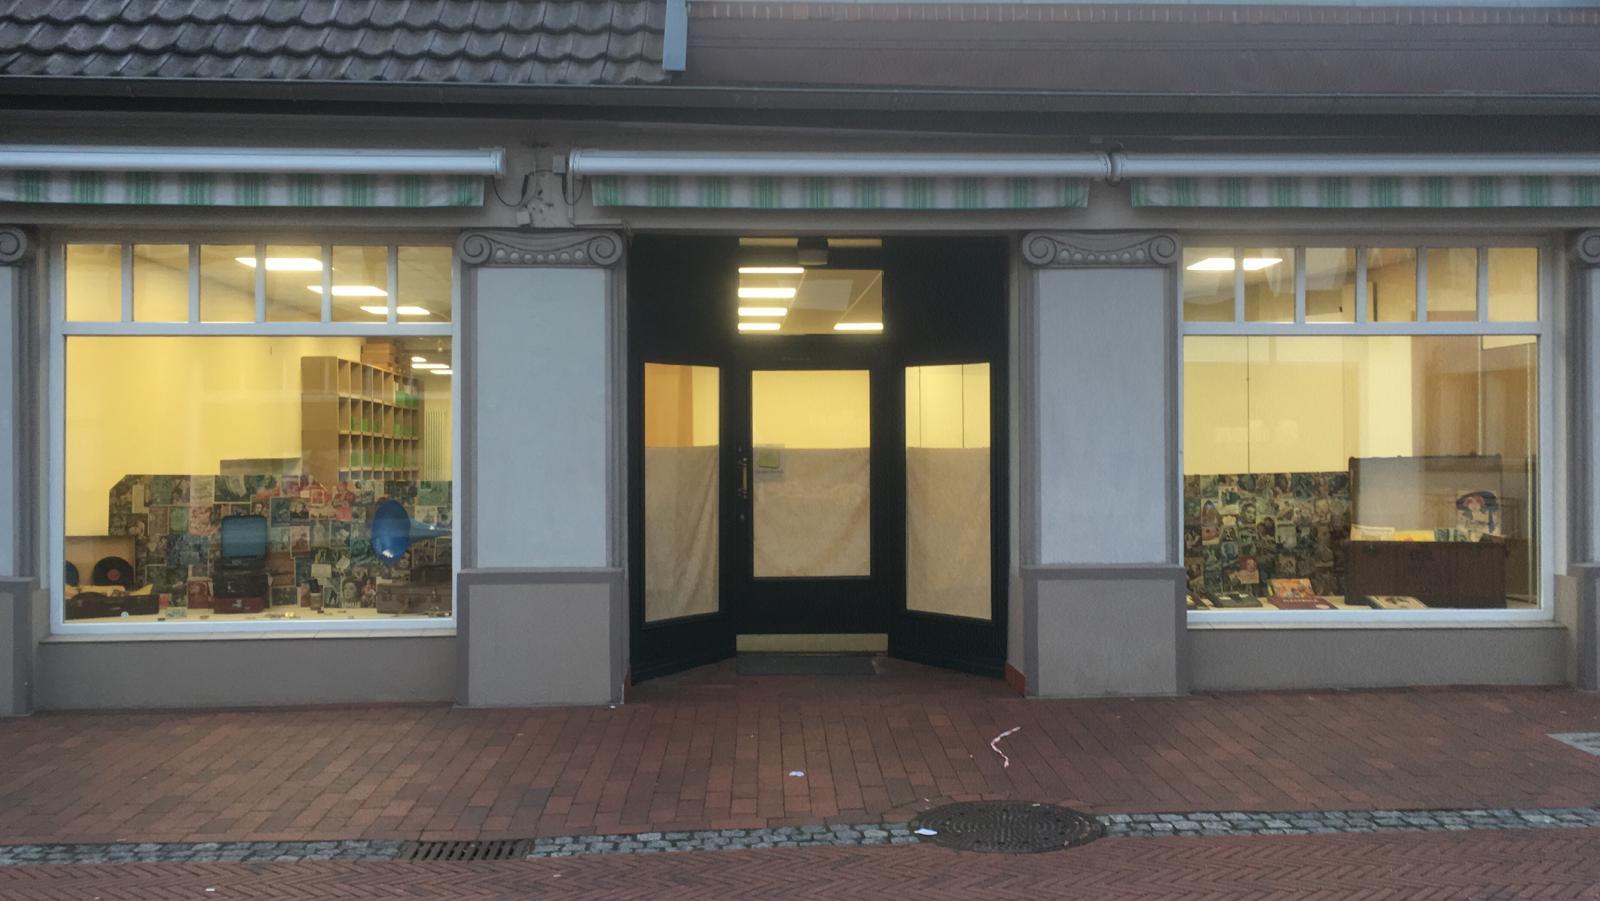 Gesamtansicht Laden Schellack-Plattenshop